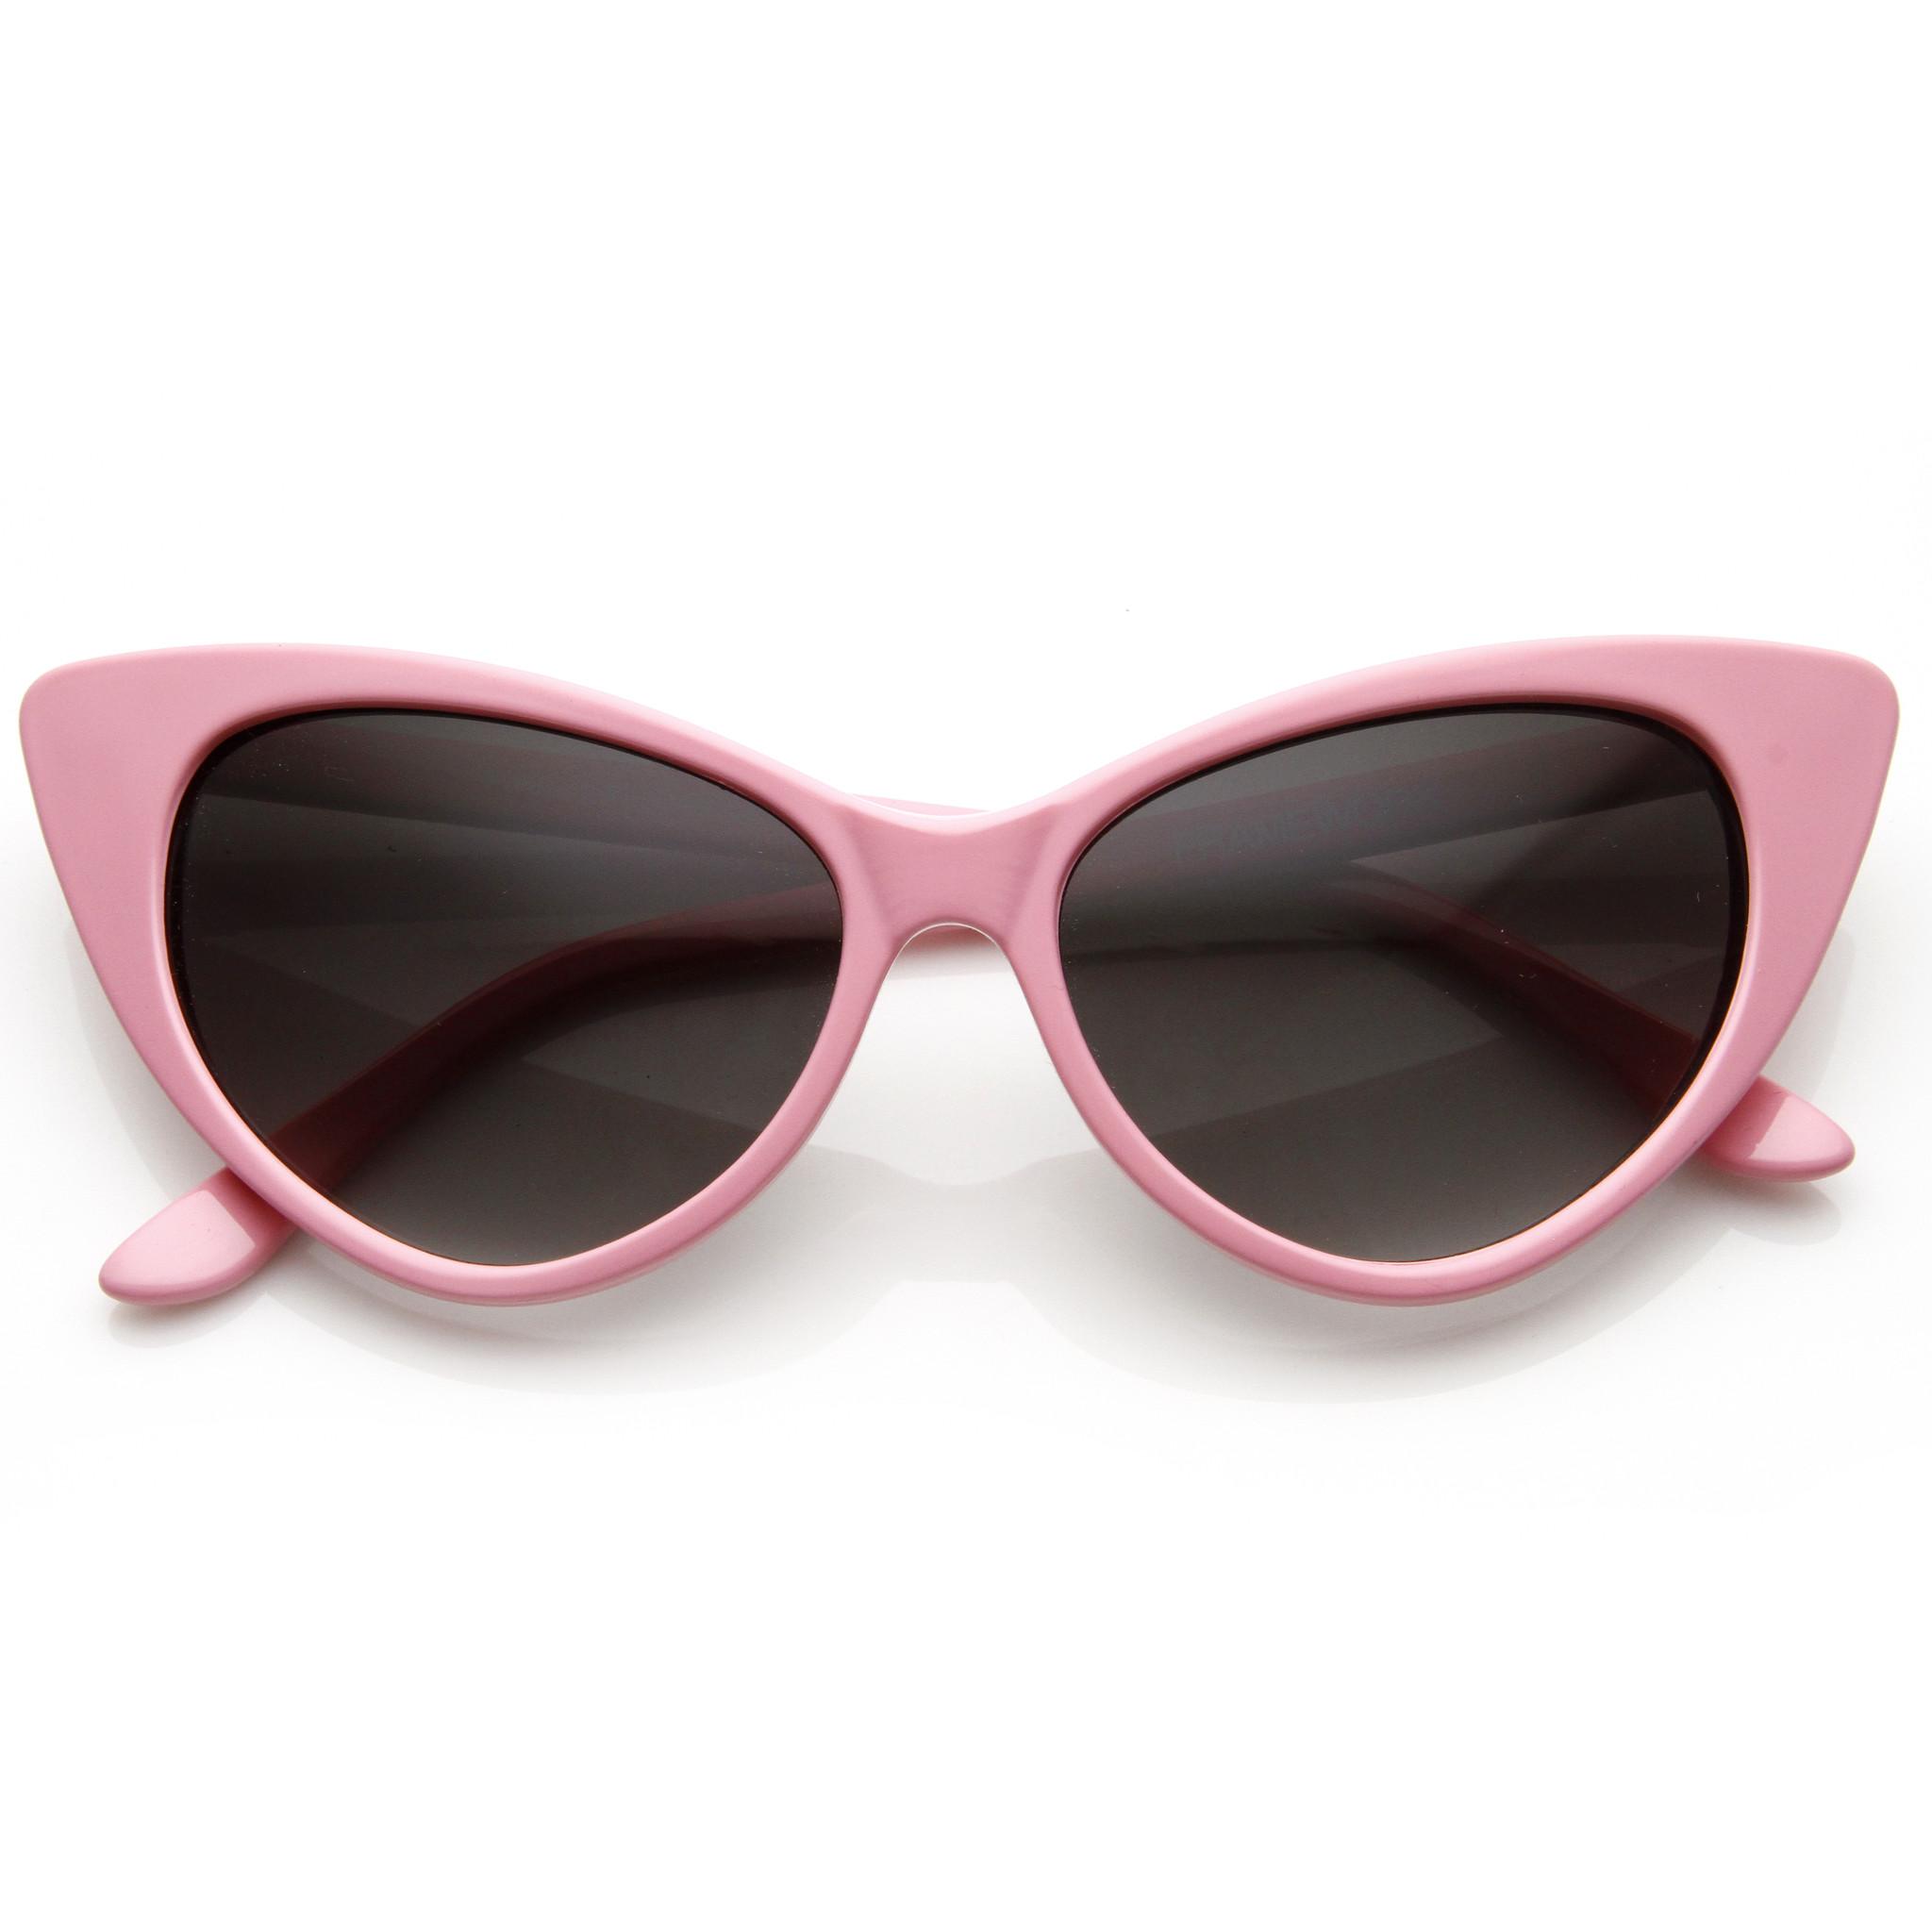 Hipnj Summer 2016 Sunglasses Trends